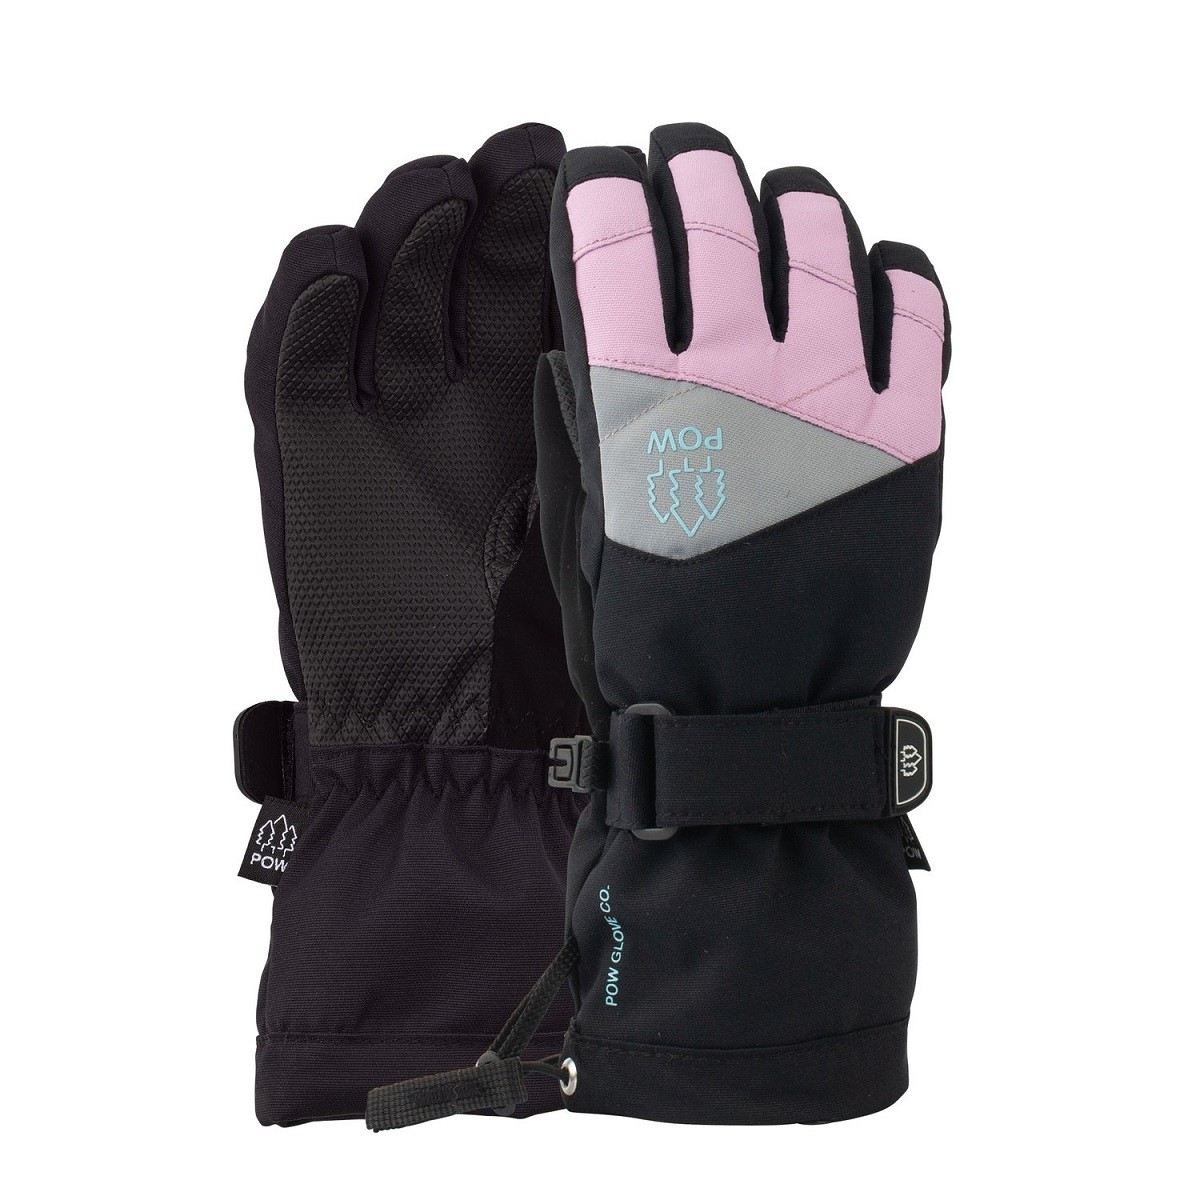 POW Ascend Glove